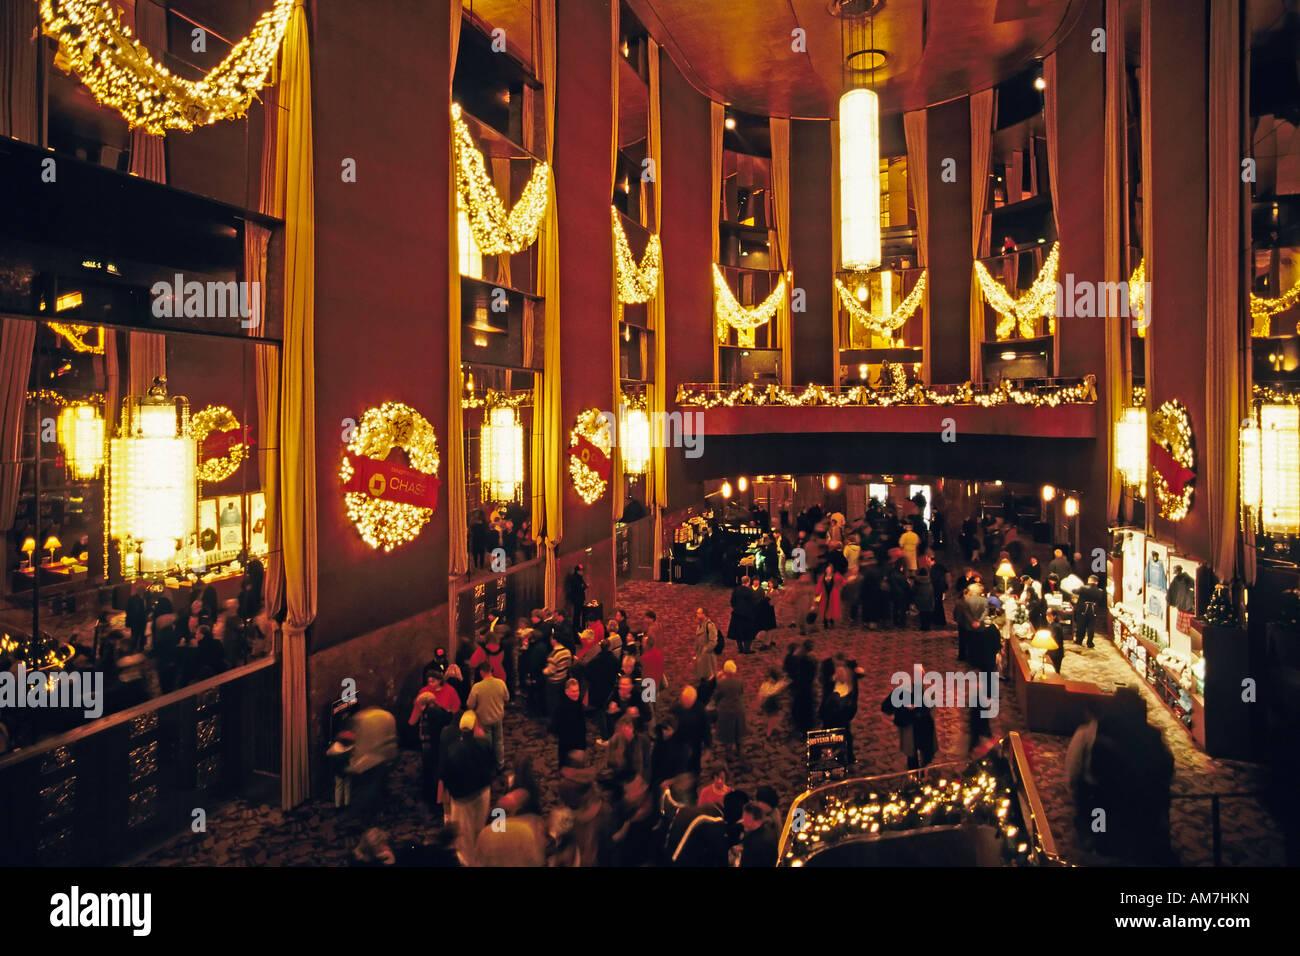 Foyer of the Radio City Music Hall, New York City, USA - Stock Image